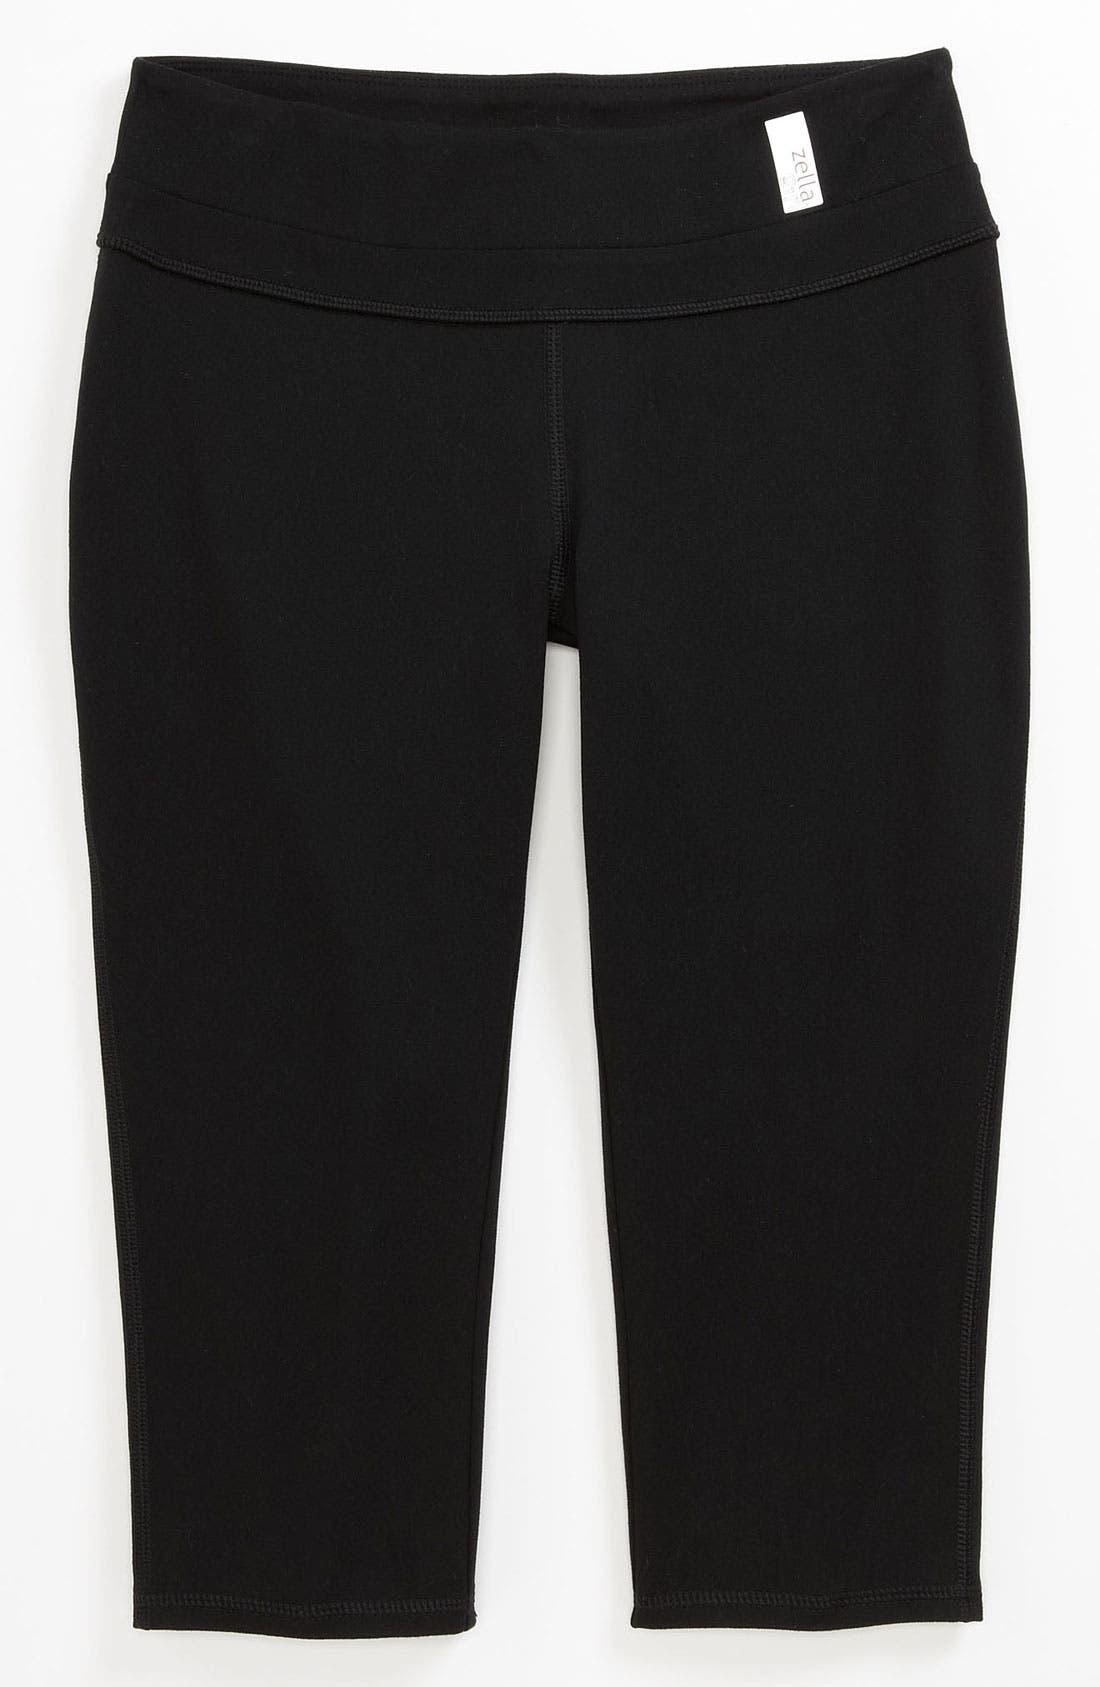 Alternate Image 1 Selected - Zella Girl 'Trainer' Capri Pants (Little Girls & Big Girls)